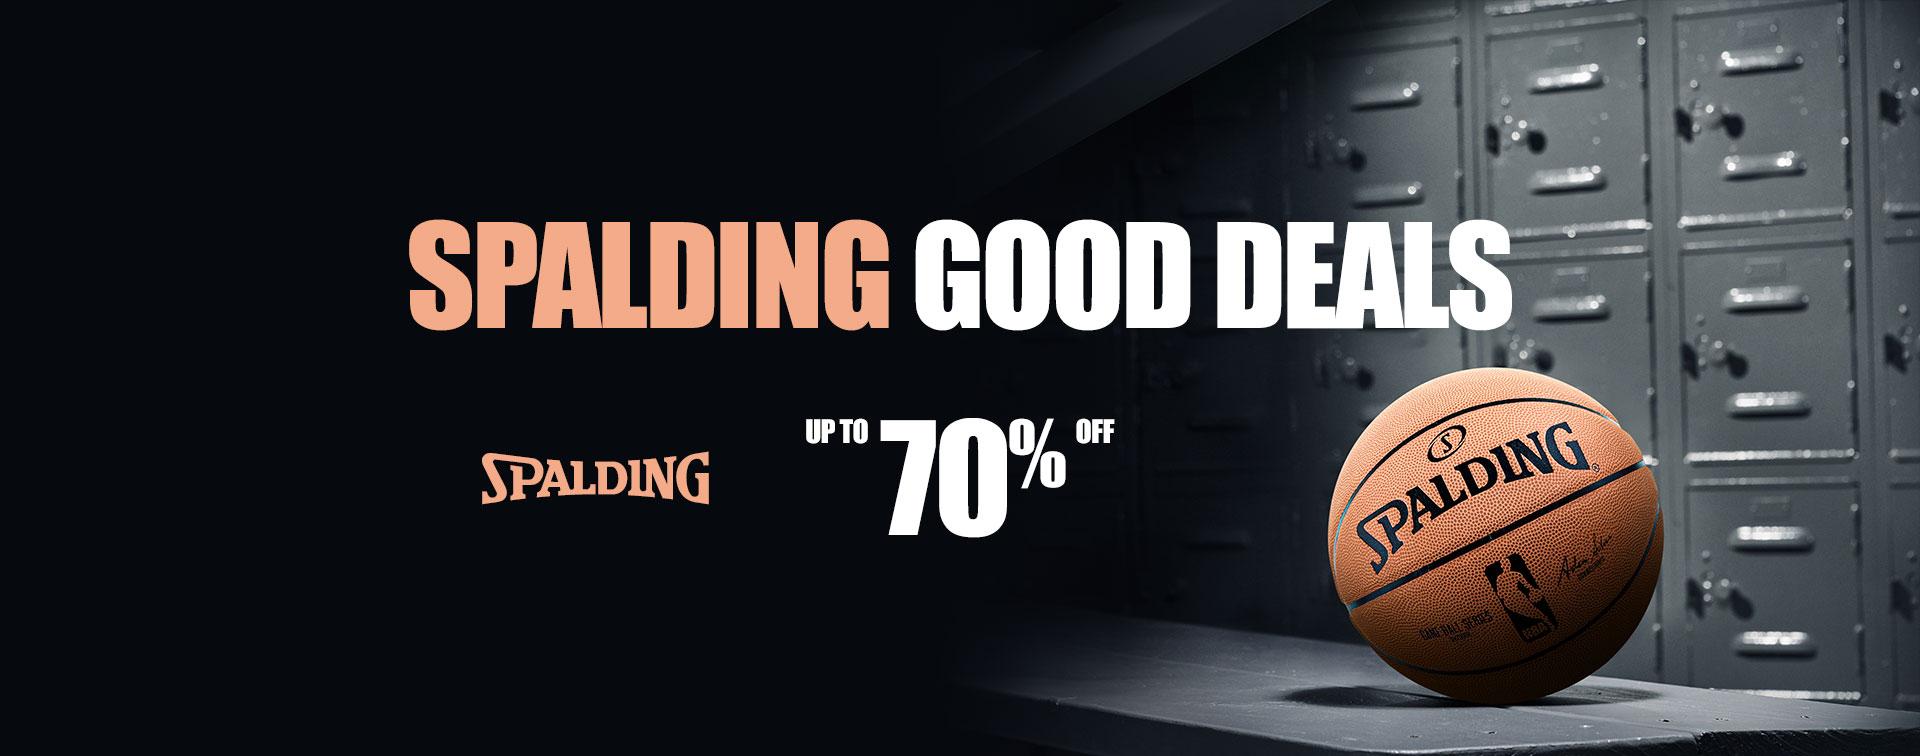 Spalding Good Deals